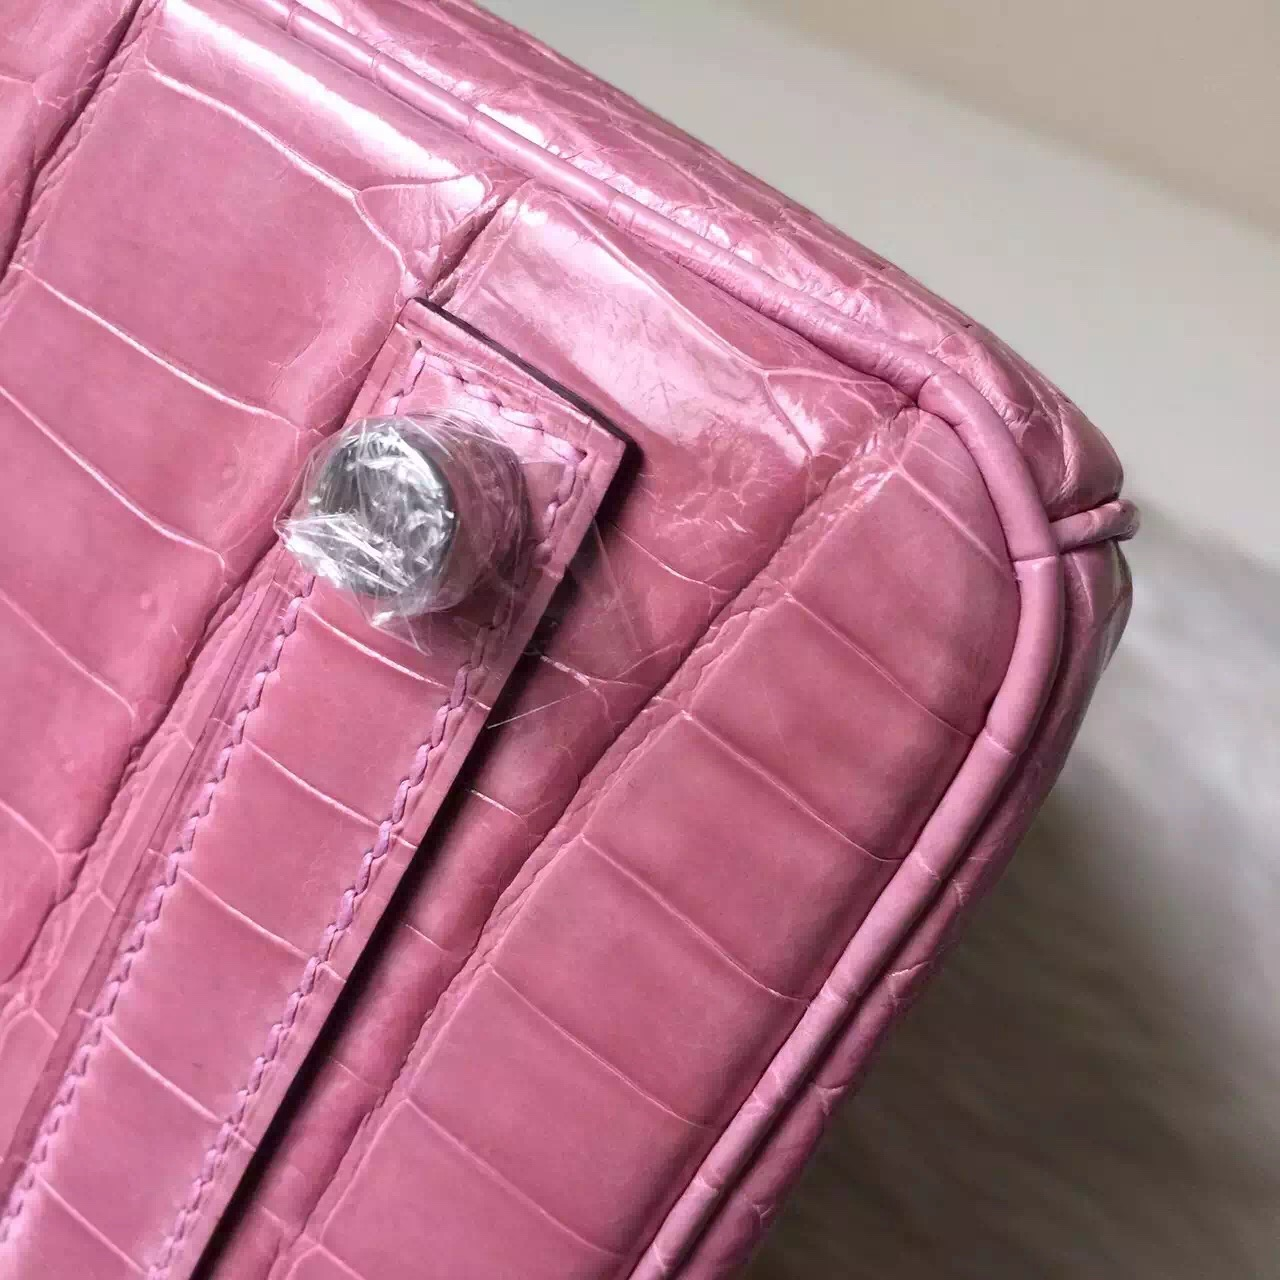 Women's Bag Hermes Crocodile Shiny Leather Birkin 30cm in Peach Pink